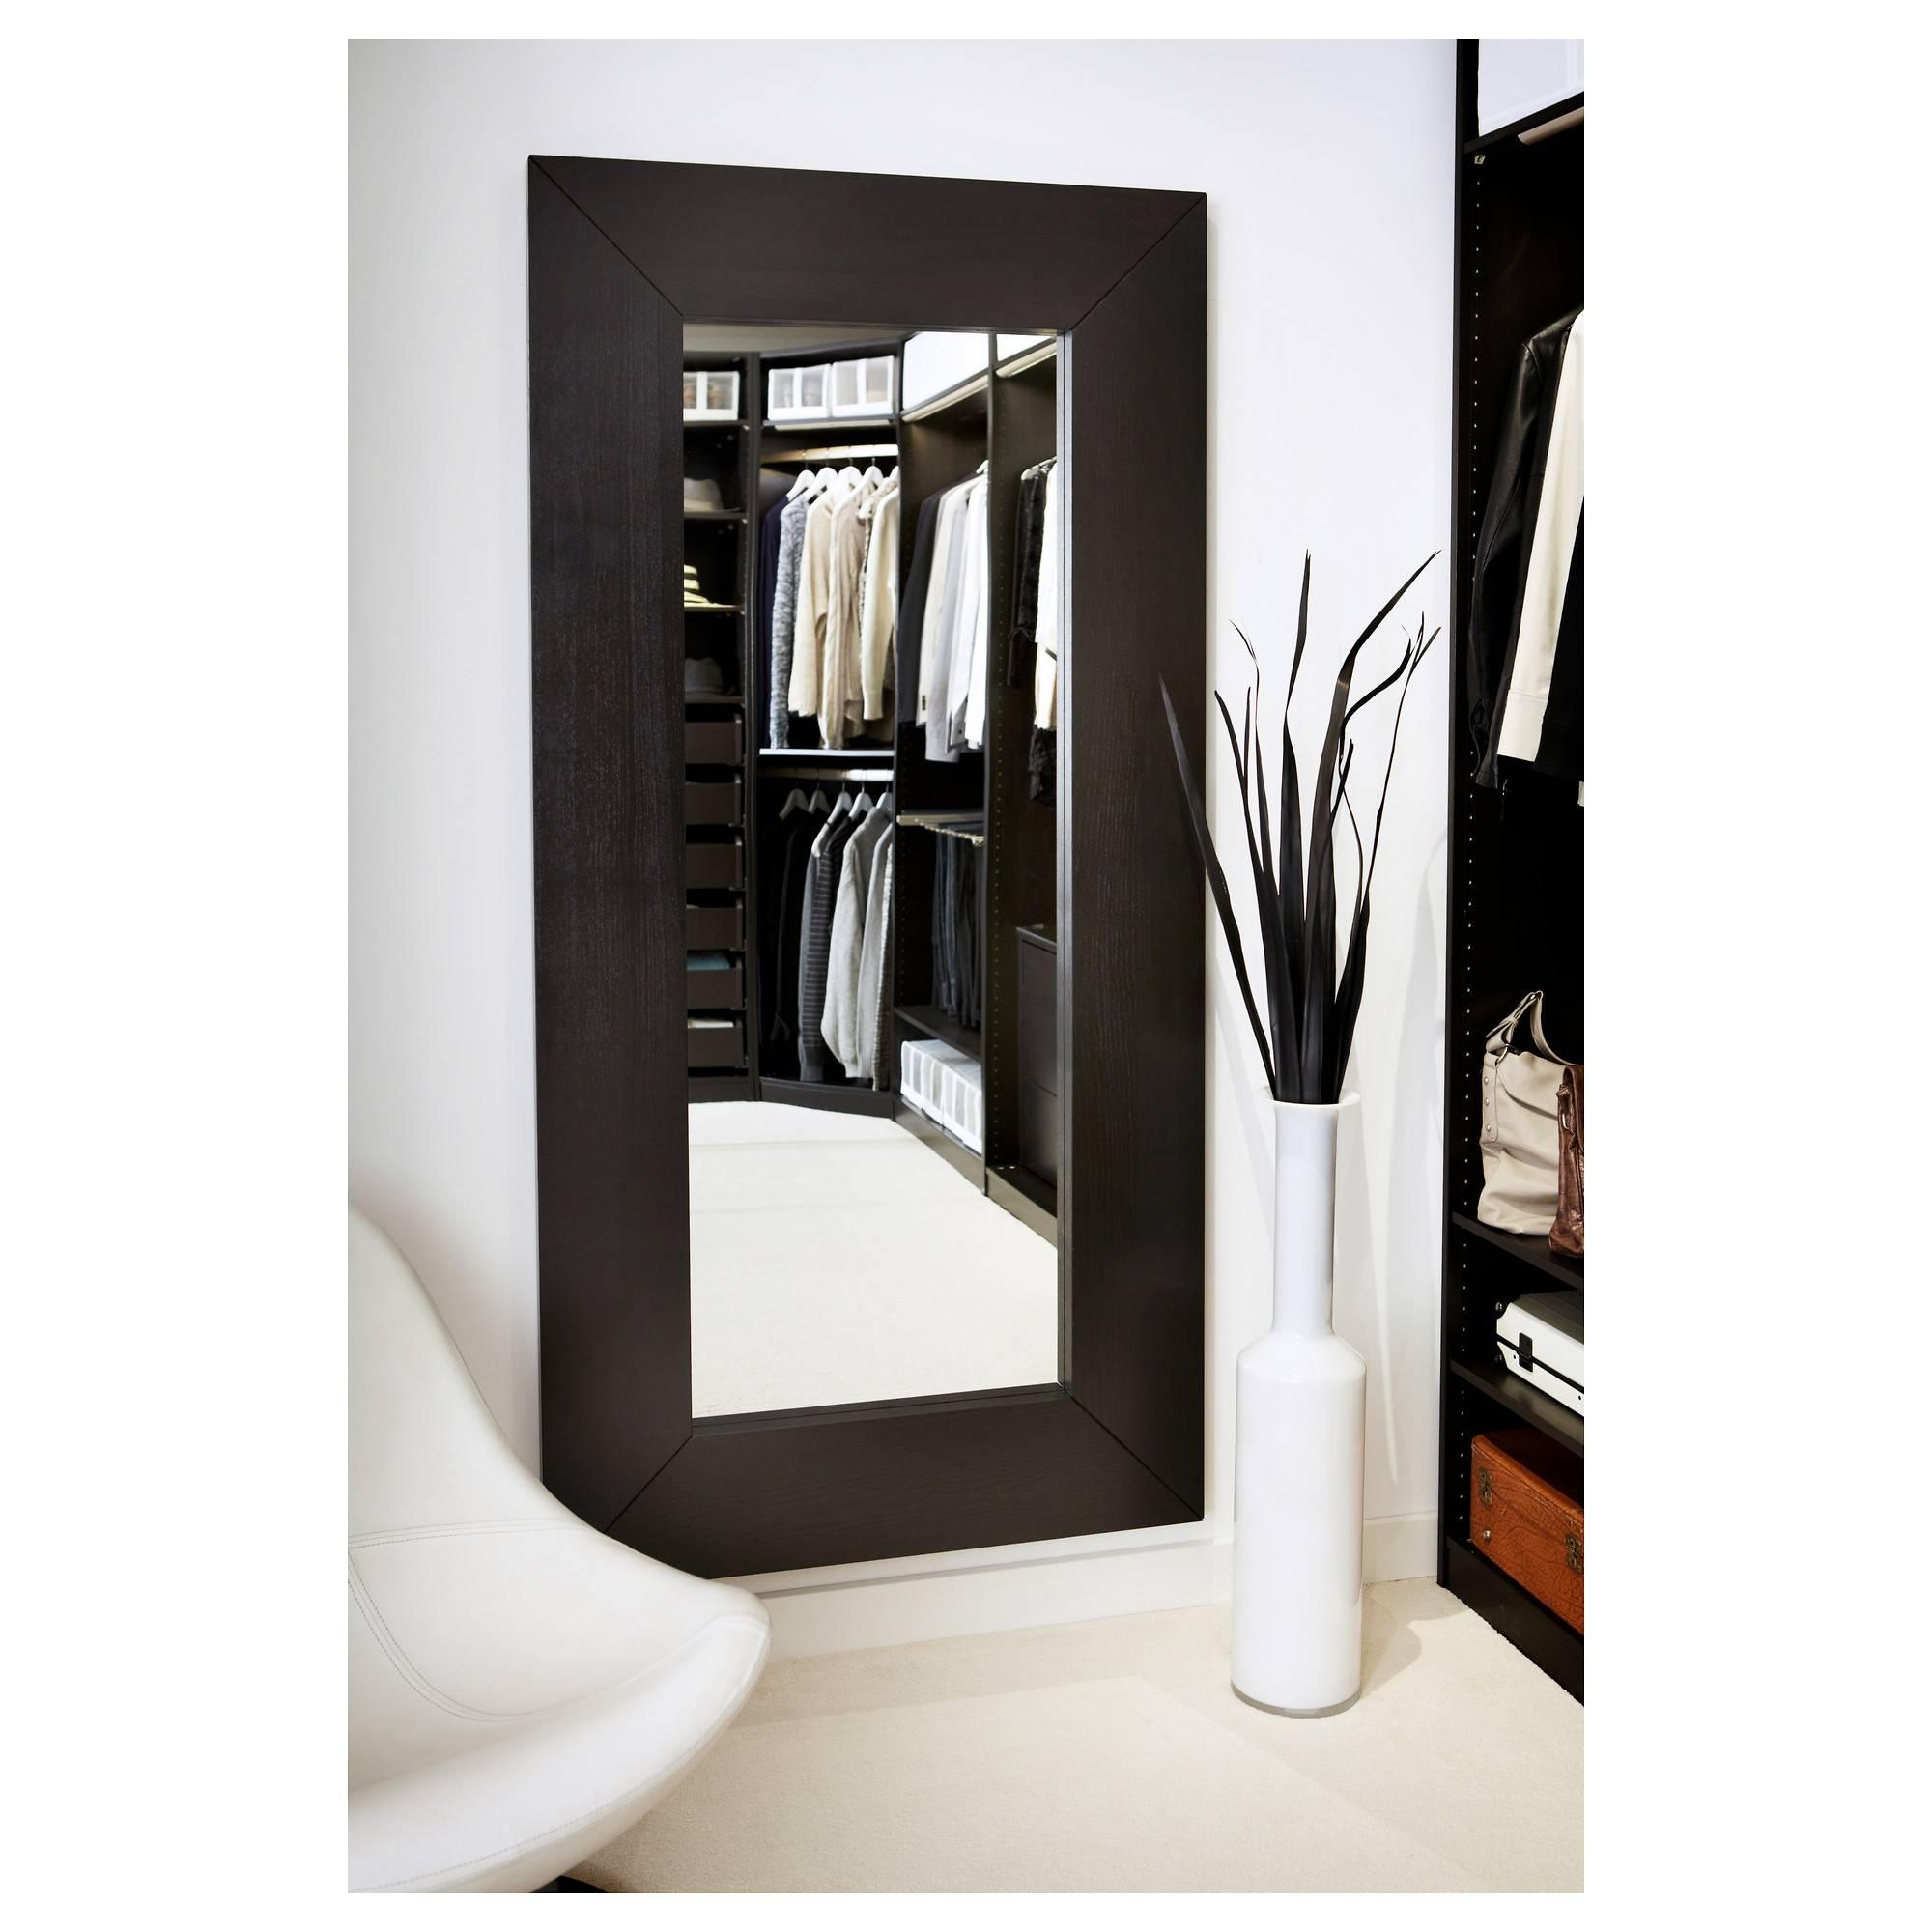 Mongstad Mirror Black Brown 94X190 Cm – Ikea Within Black Mirrors (View 9 of 15)